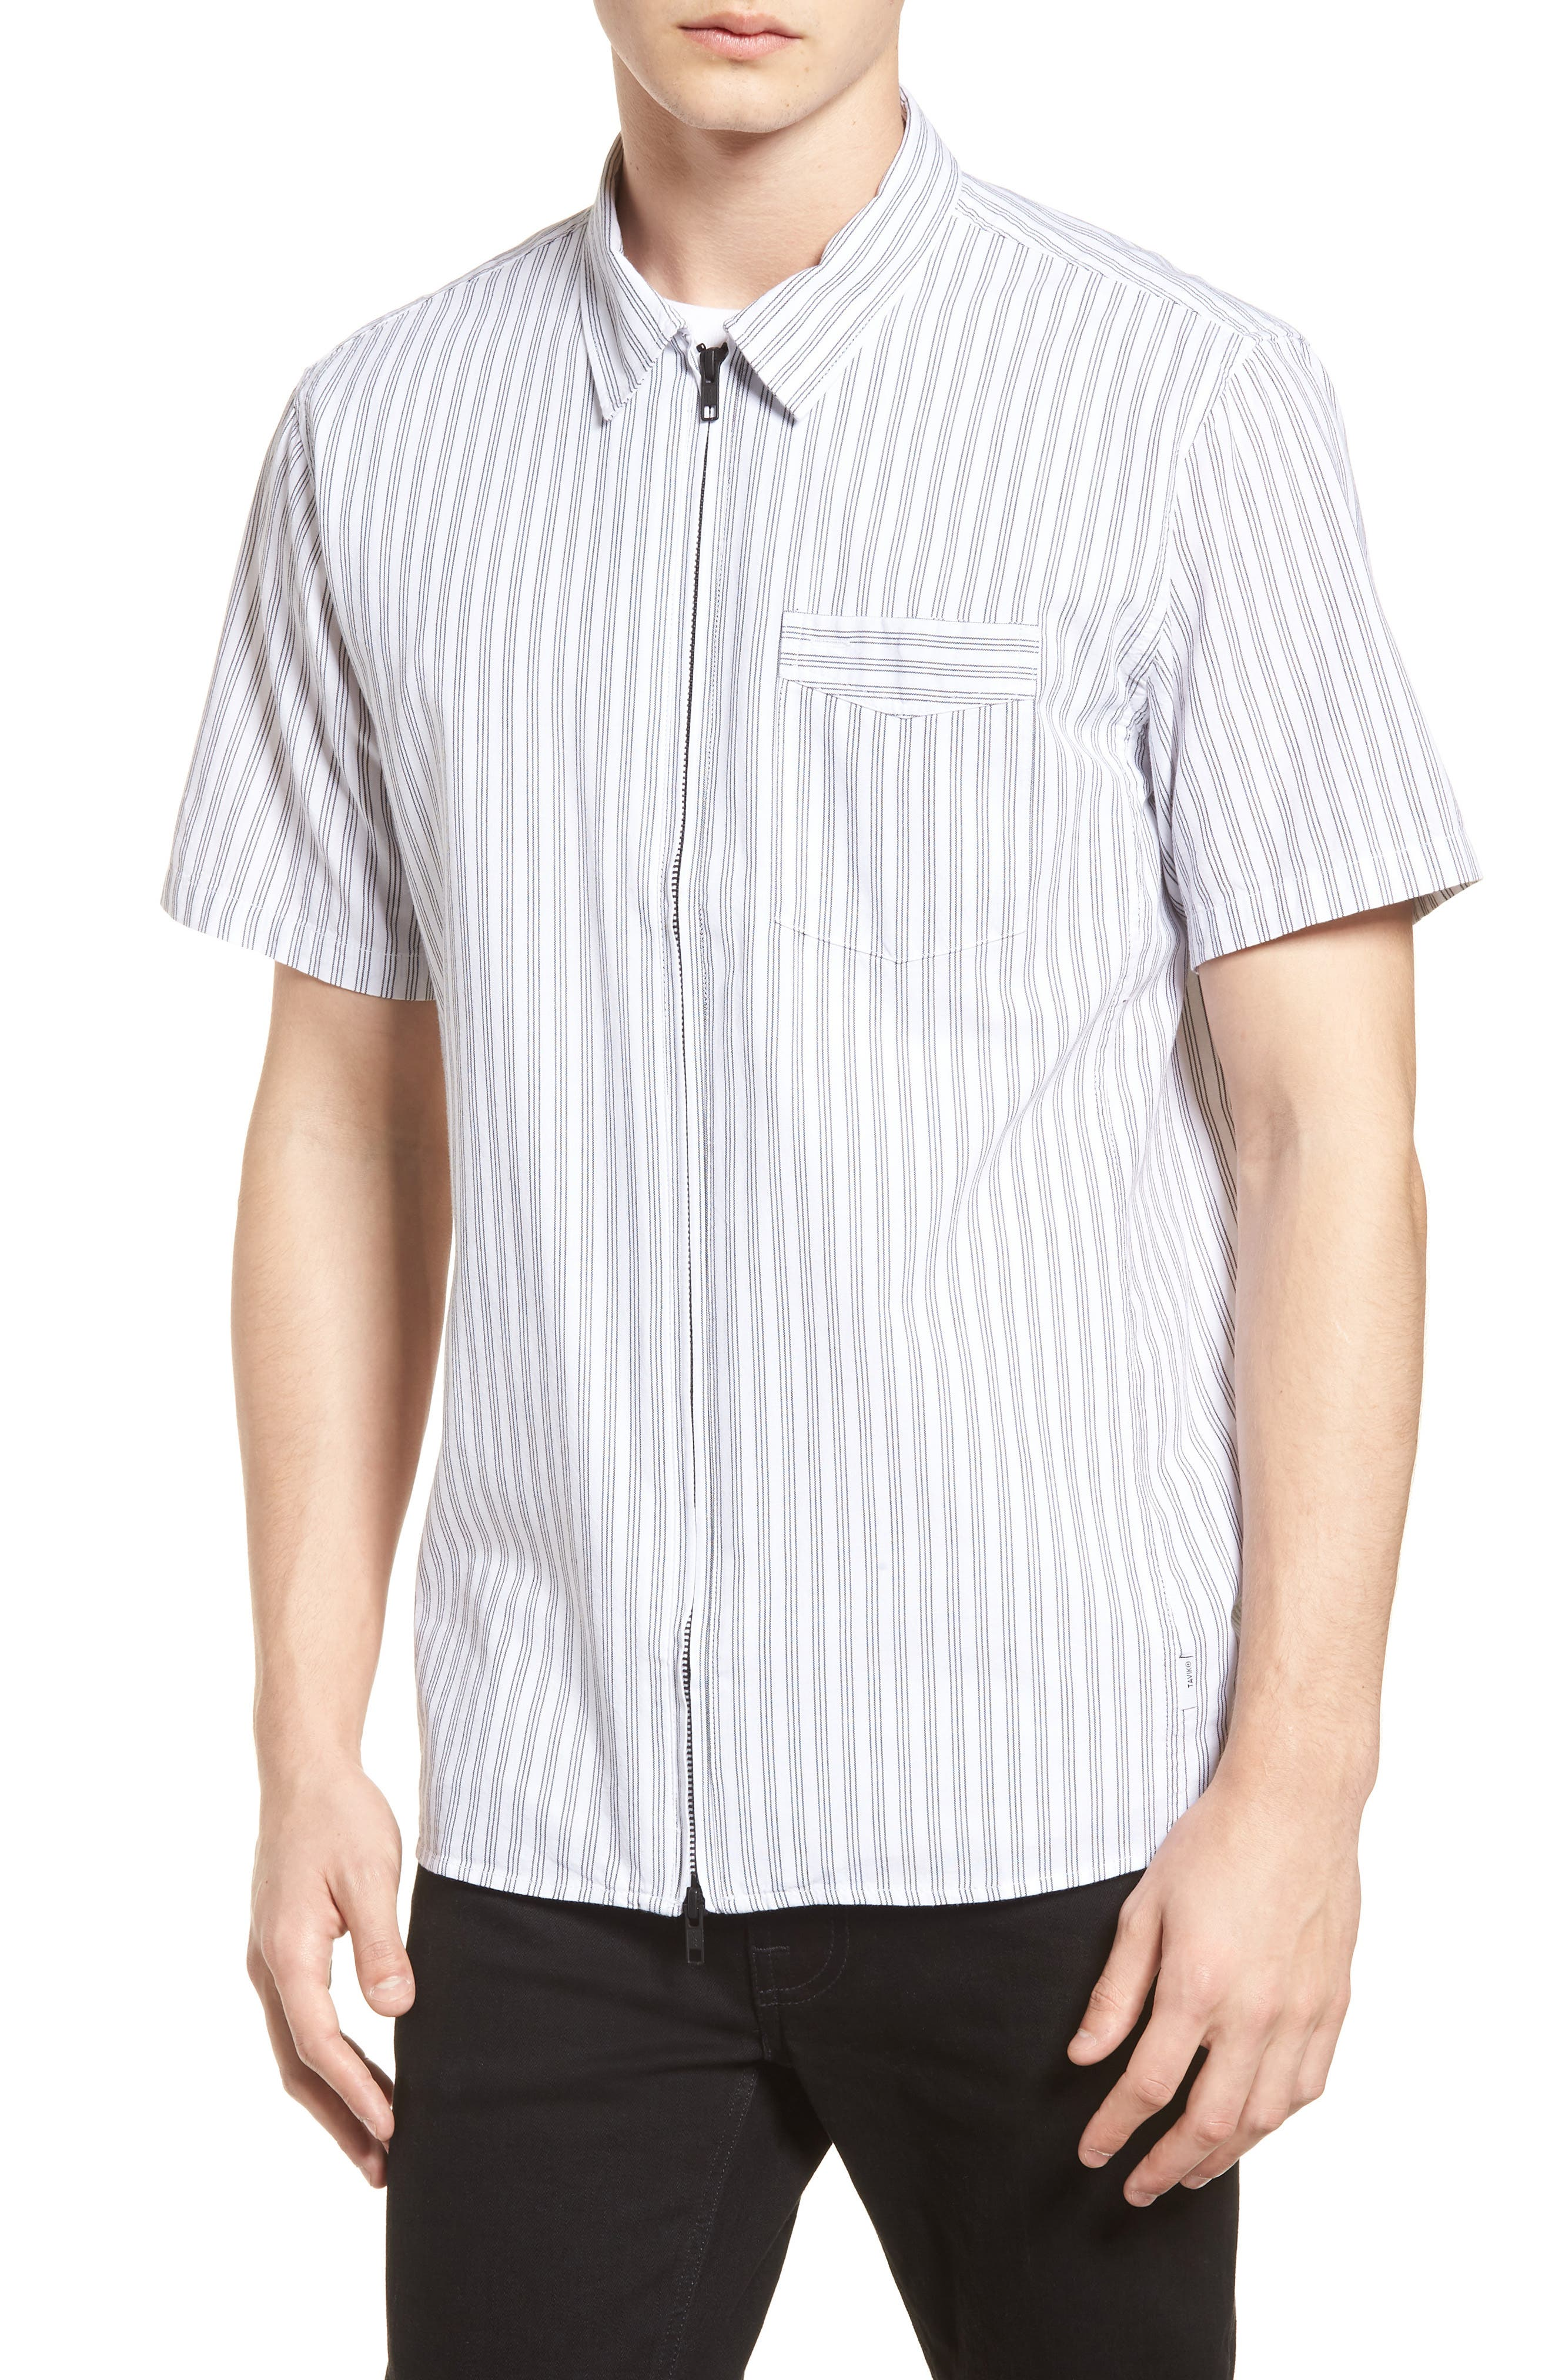 Rollins Woven Shirt,                         Main,                         color, Black/White Stripe